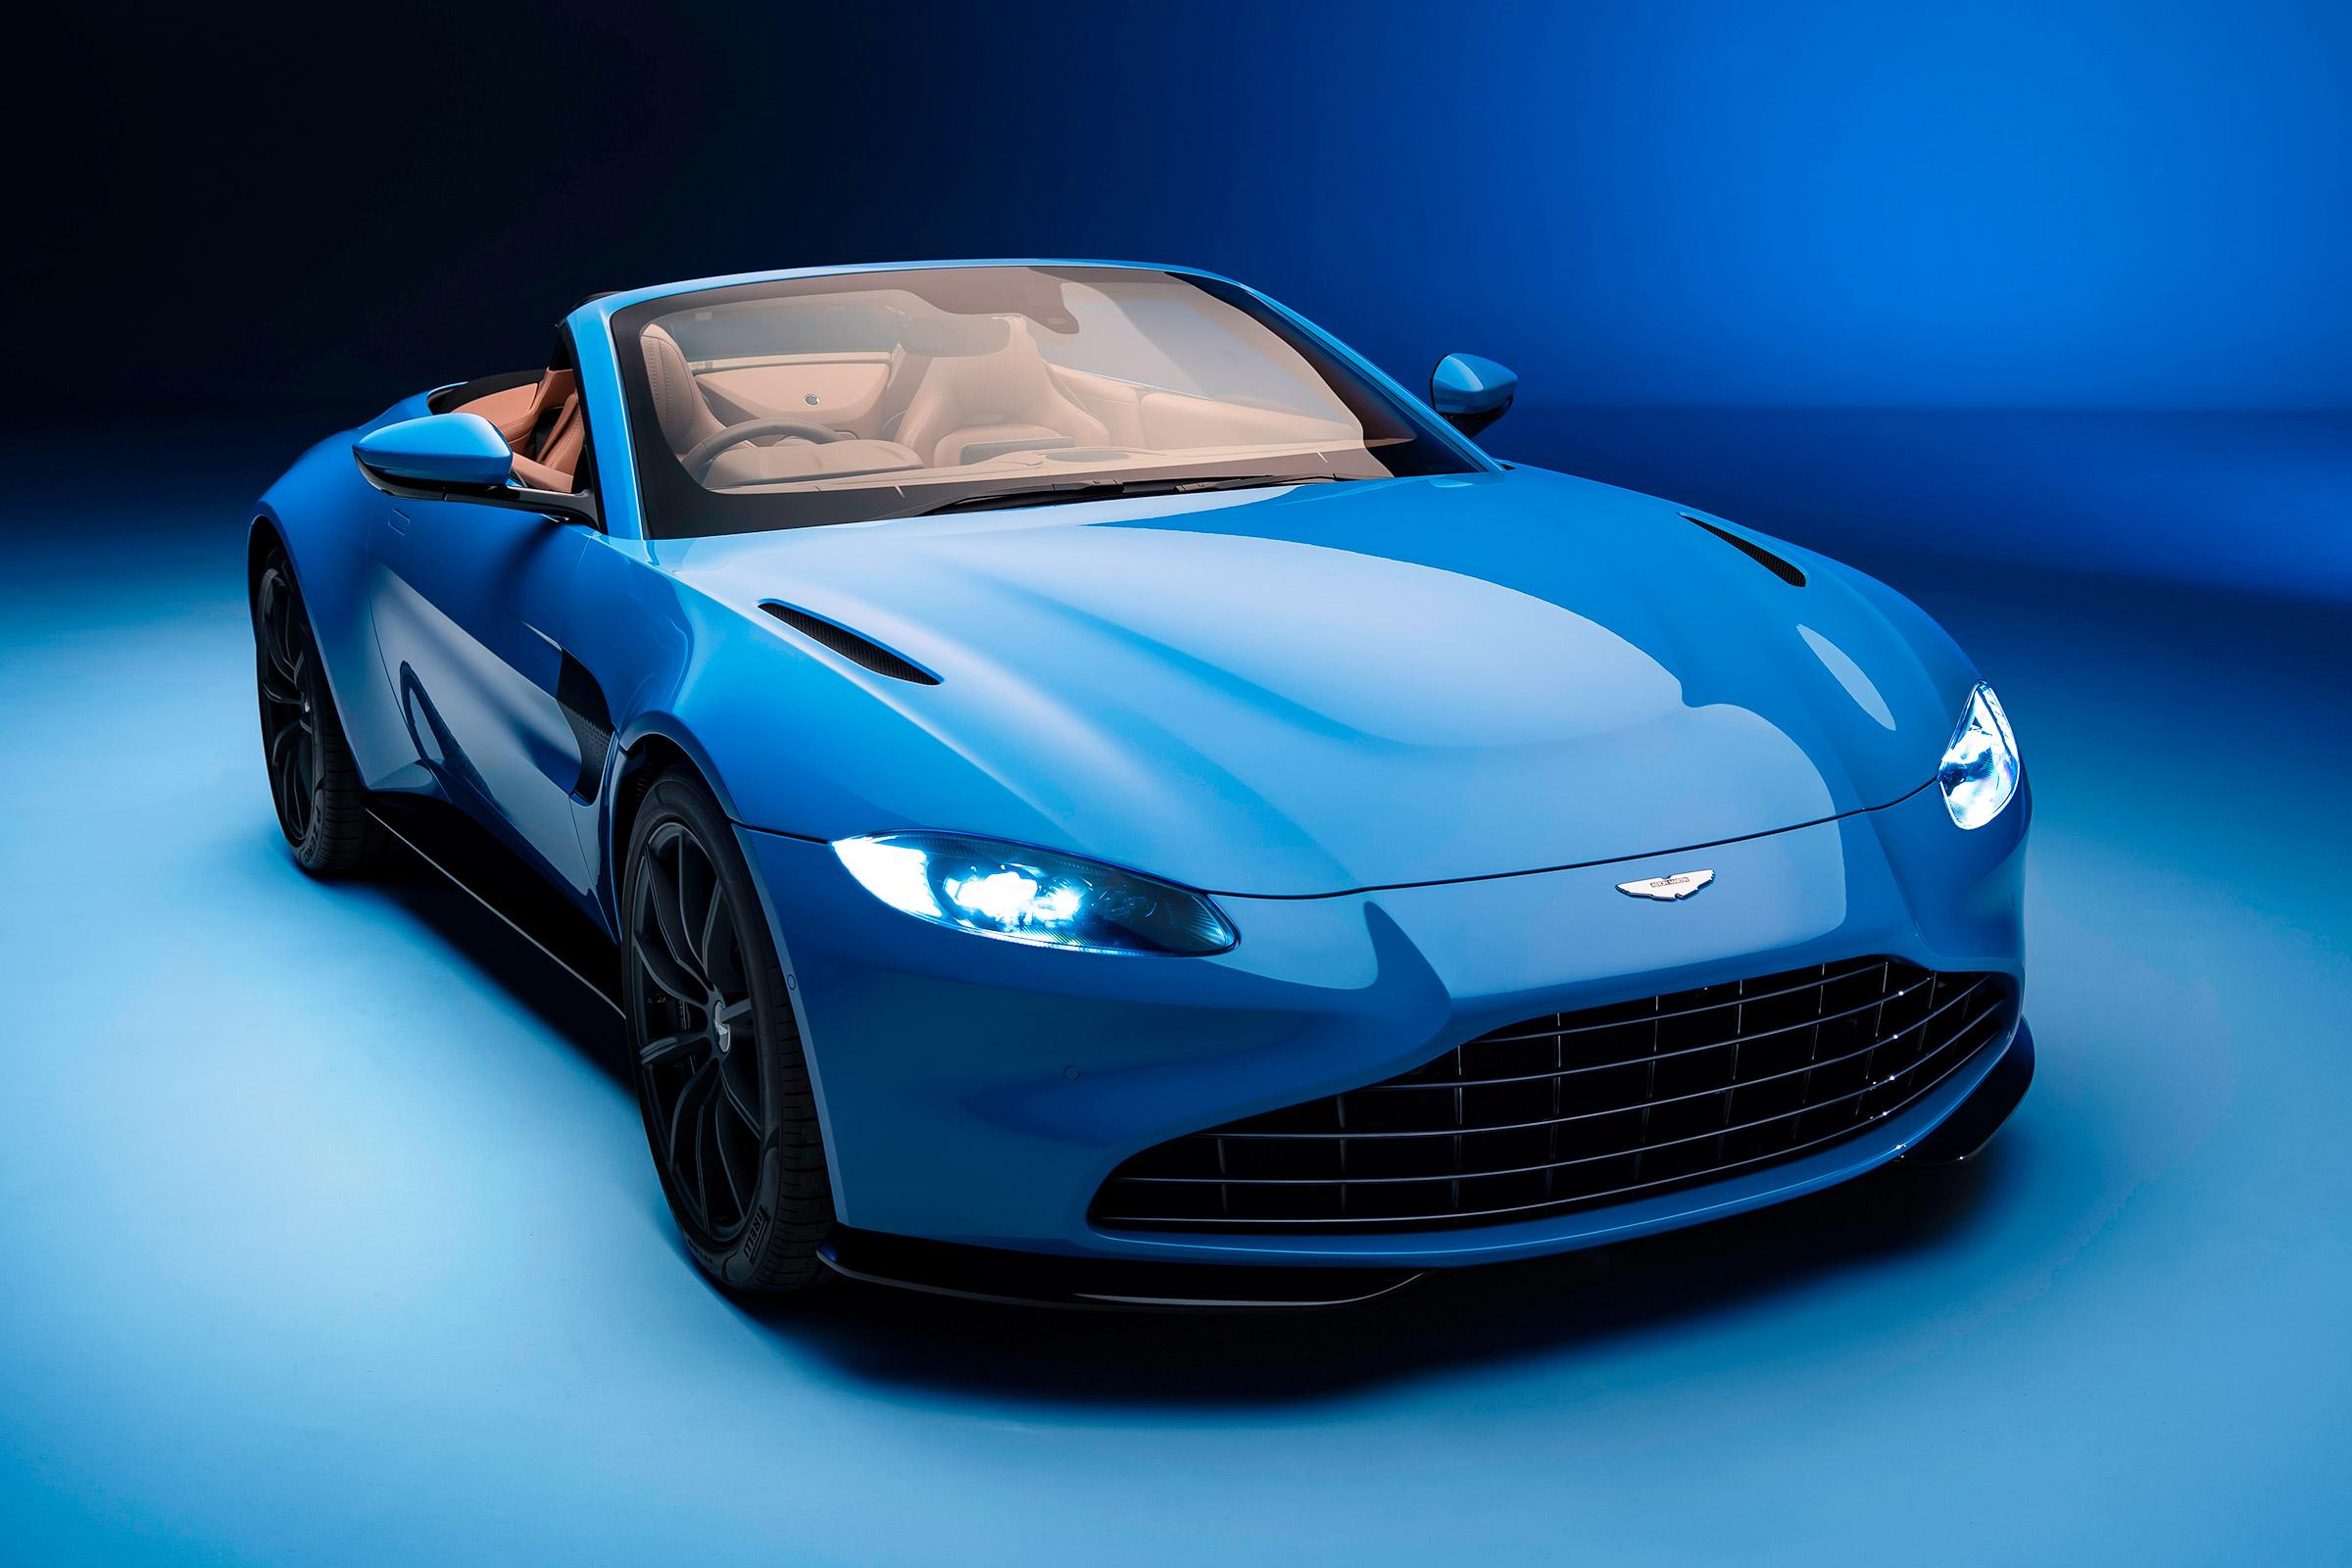 New 2020 Aston Martin Vantage Roadster Blasts In Ahead Of Geneva Auto Express